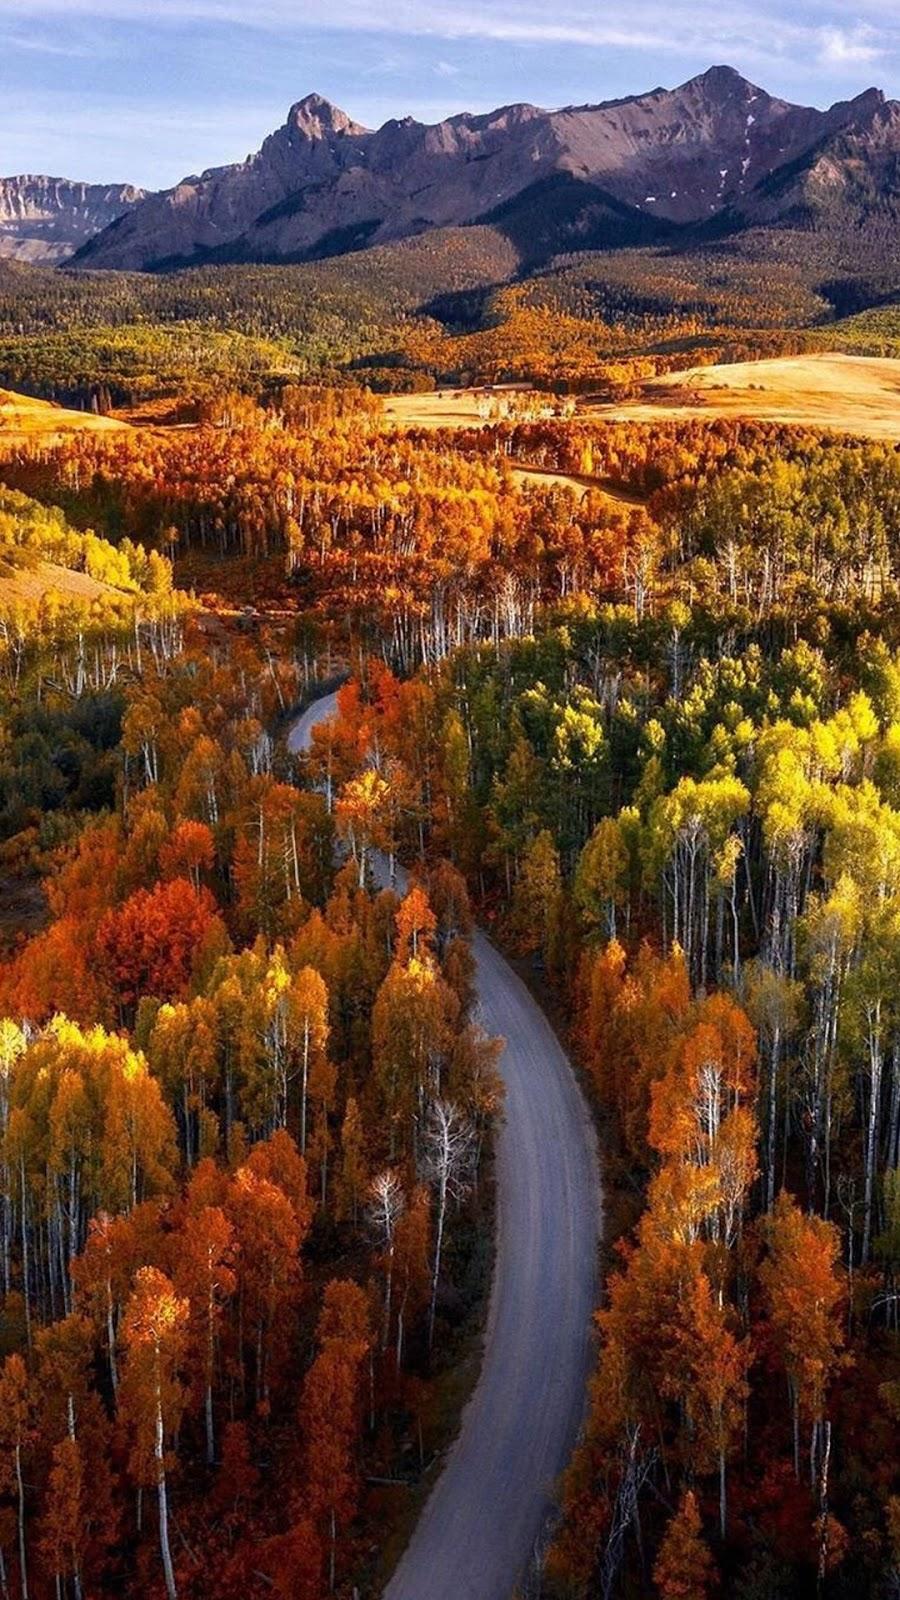 A road through the wilderness of Colorado